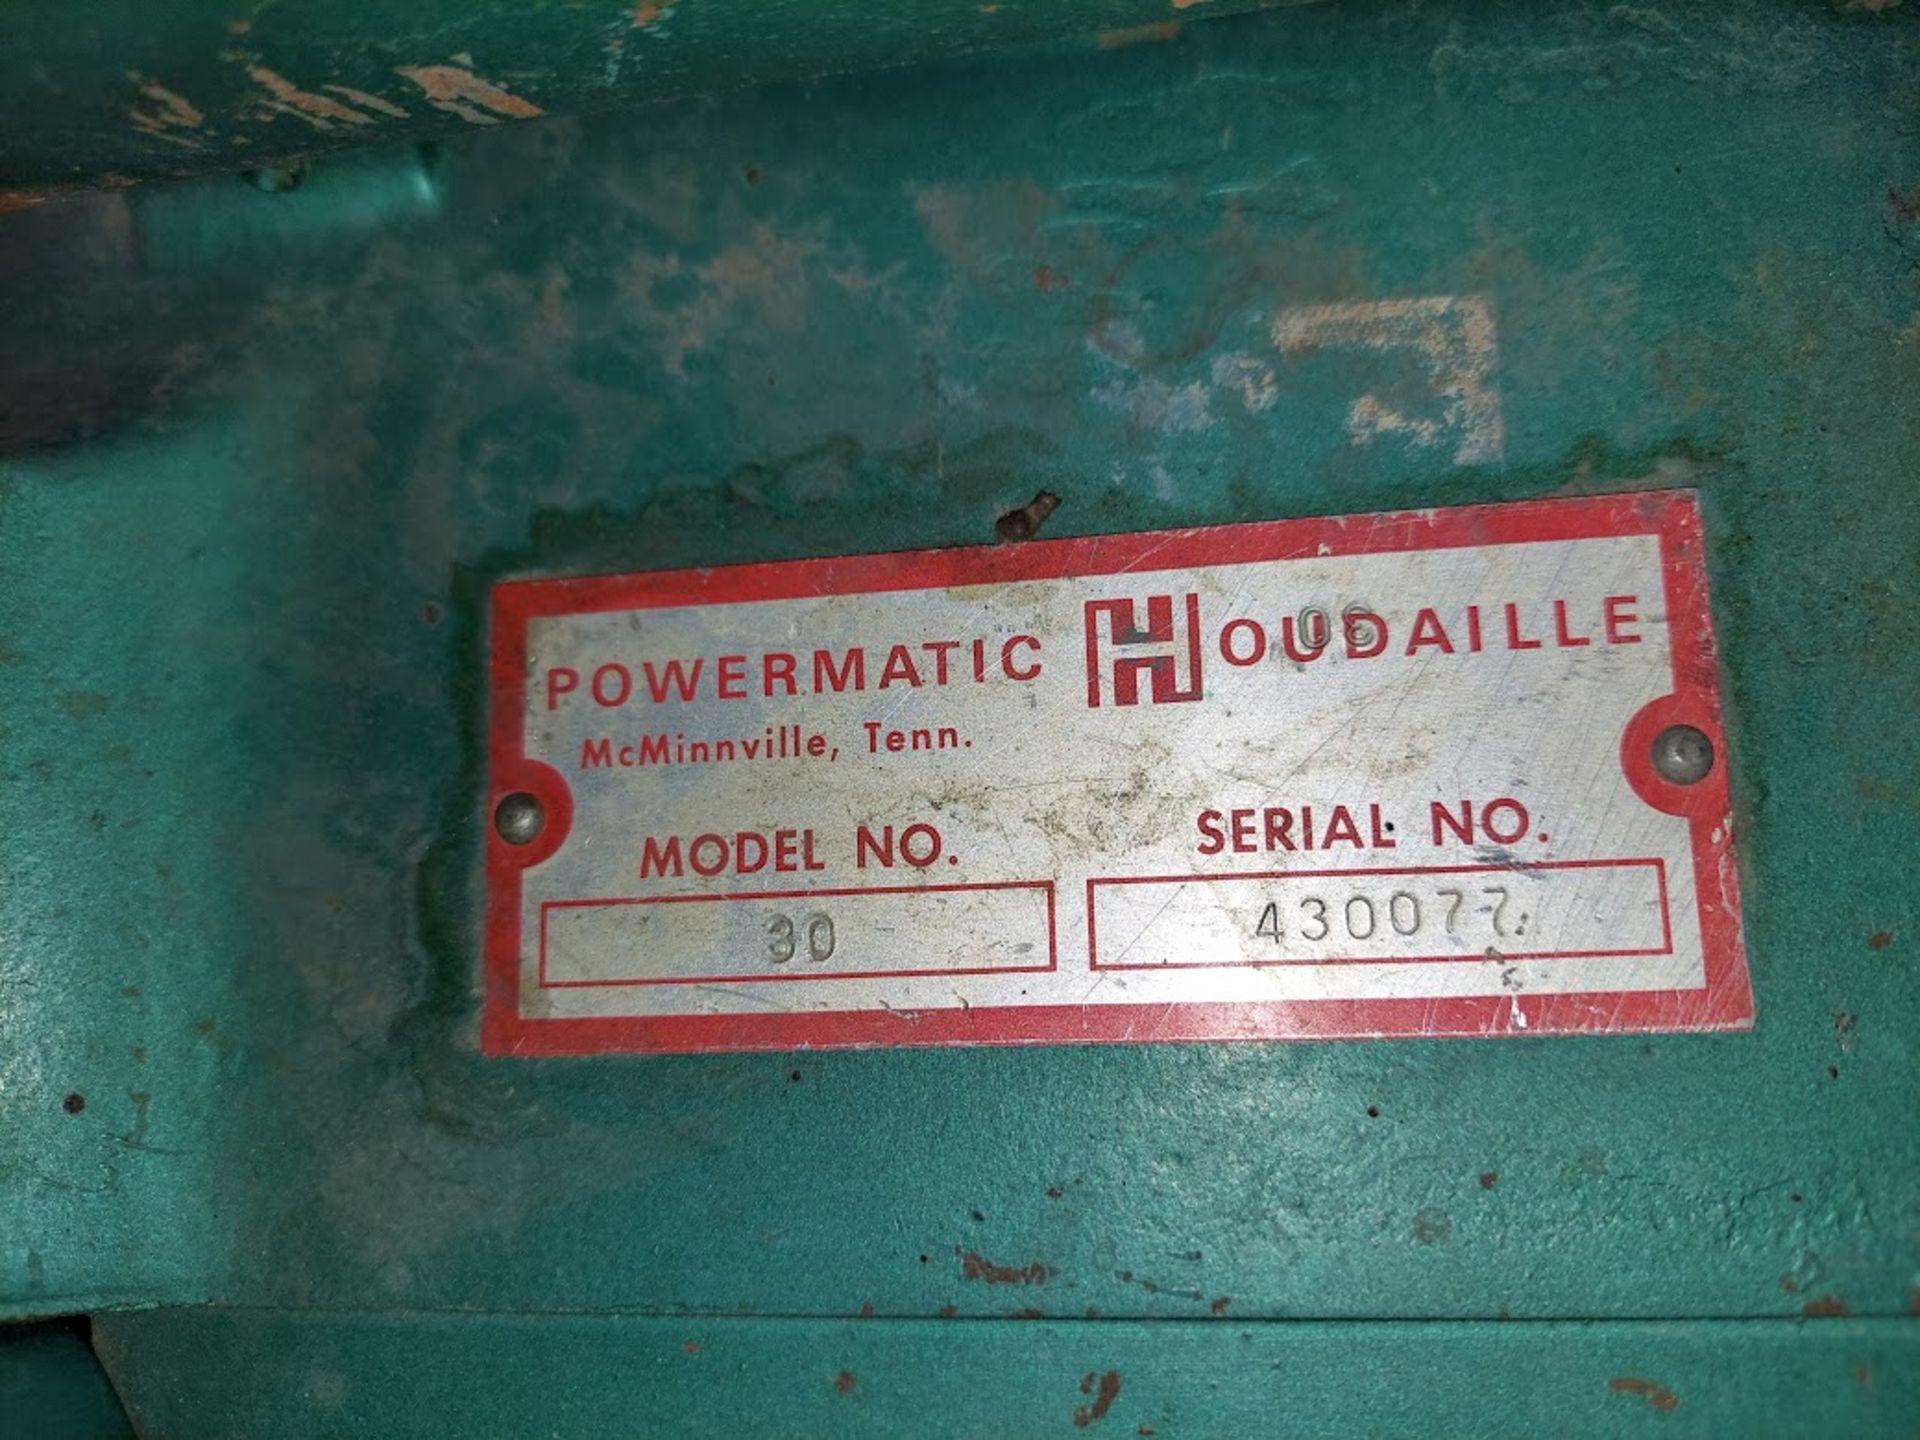 "Powermatic 6"" x 48"" Belt & 12"" Disc Sander, Model #30, 115/230 Volts 1 Phase Motor - Image 5 of 5"